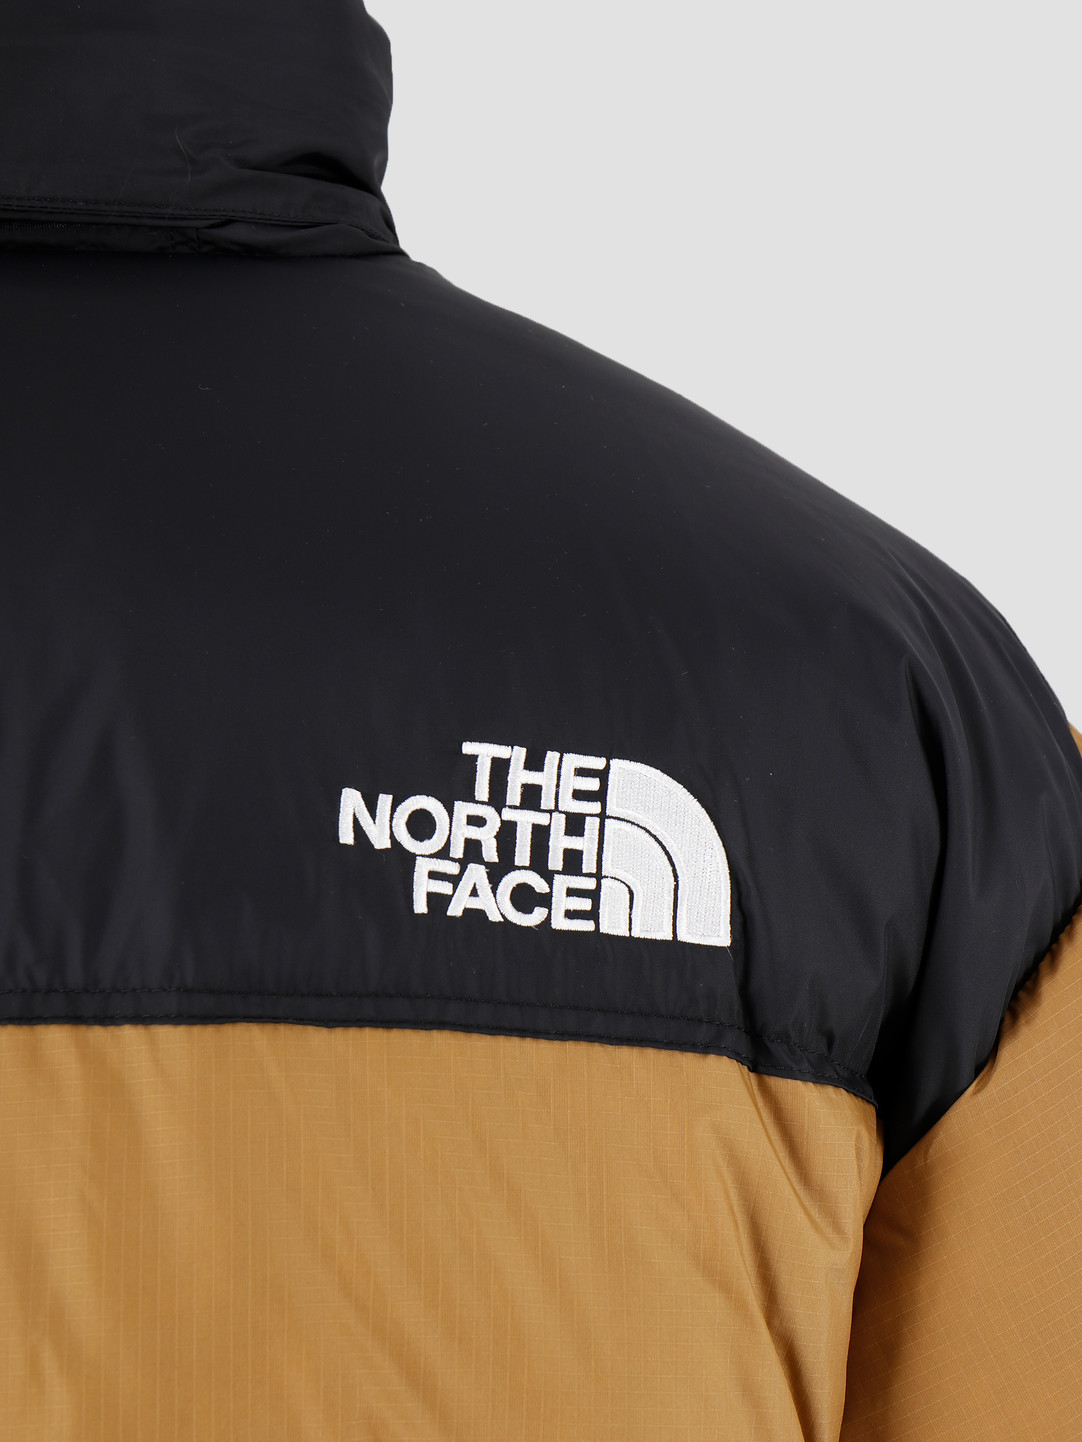 The North Face The North Face 1996 Retro Nuptse Jacket British Khaki T93C8DD9V